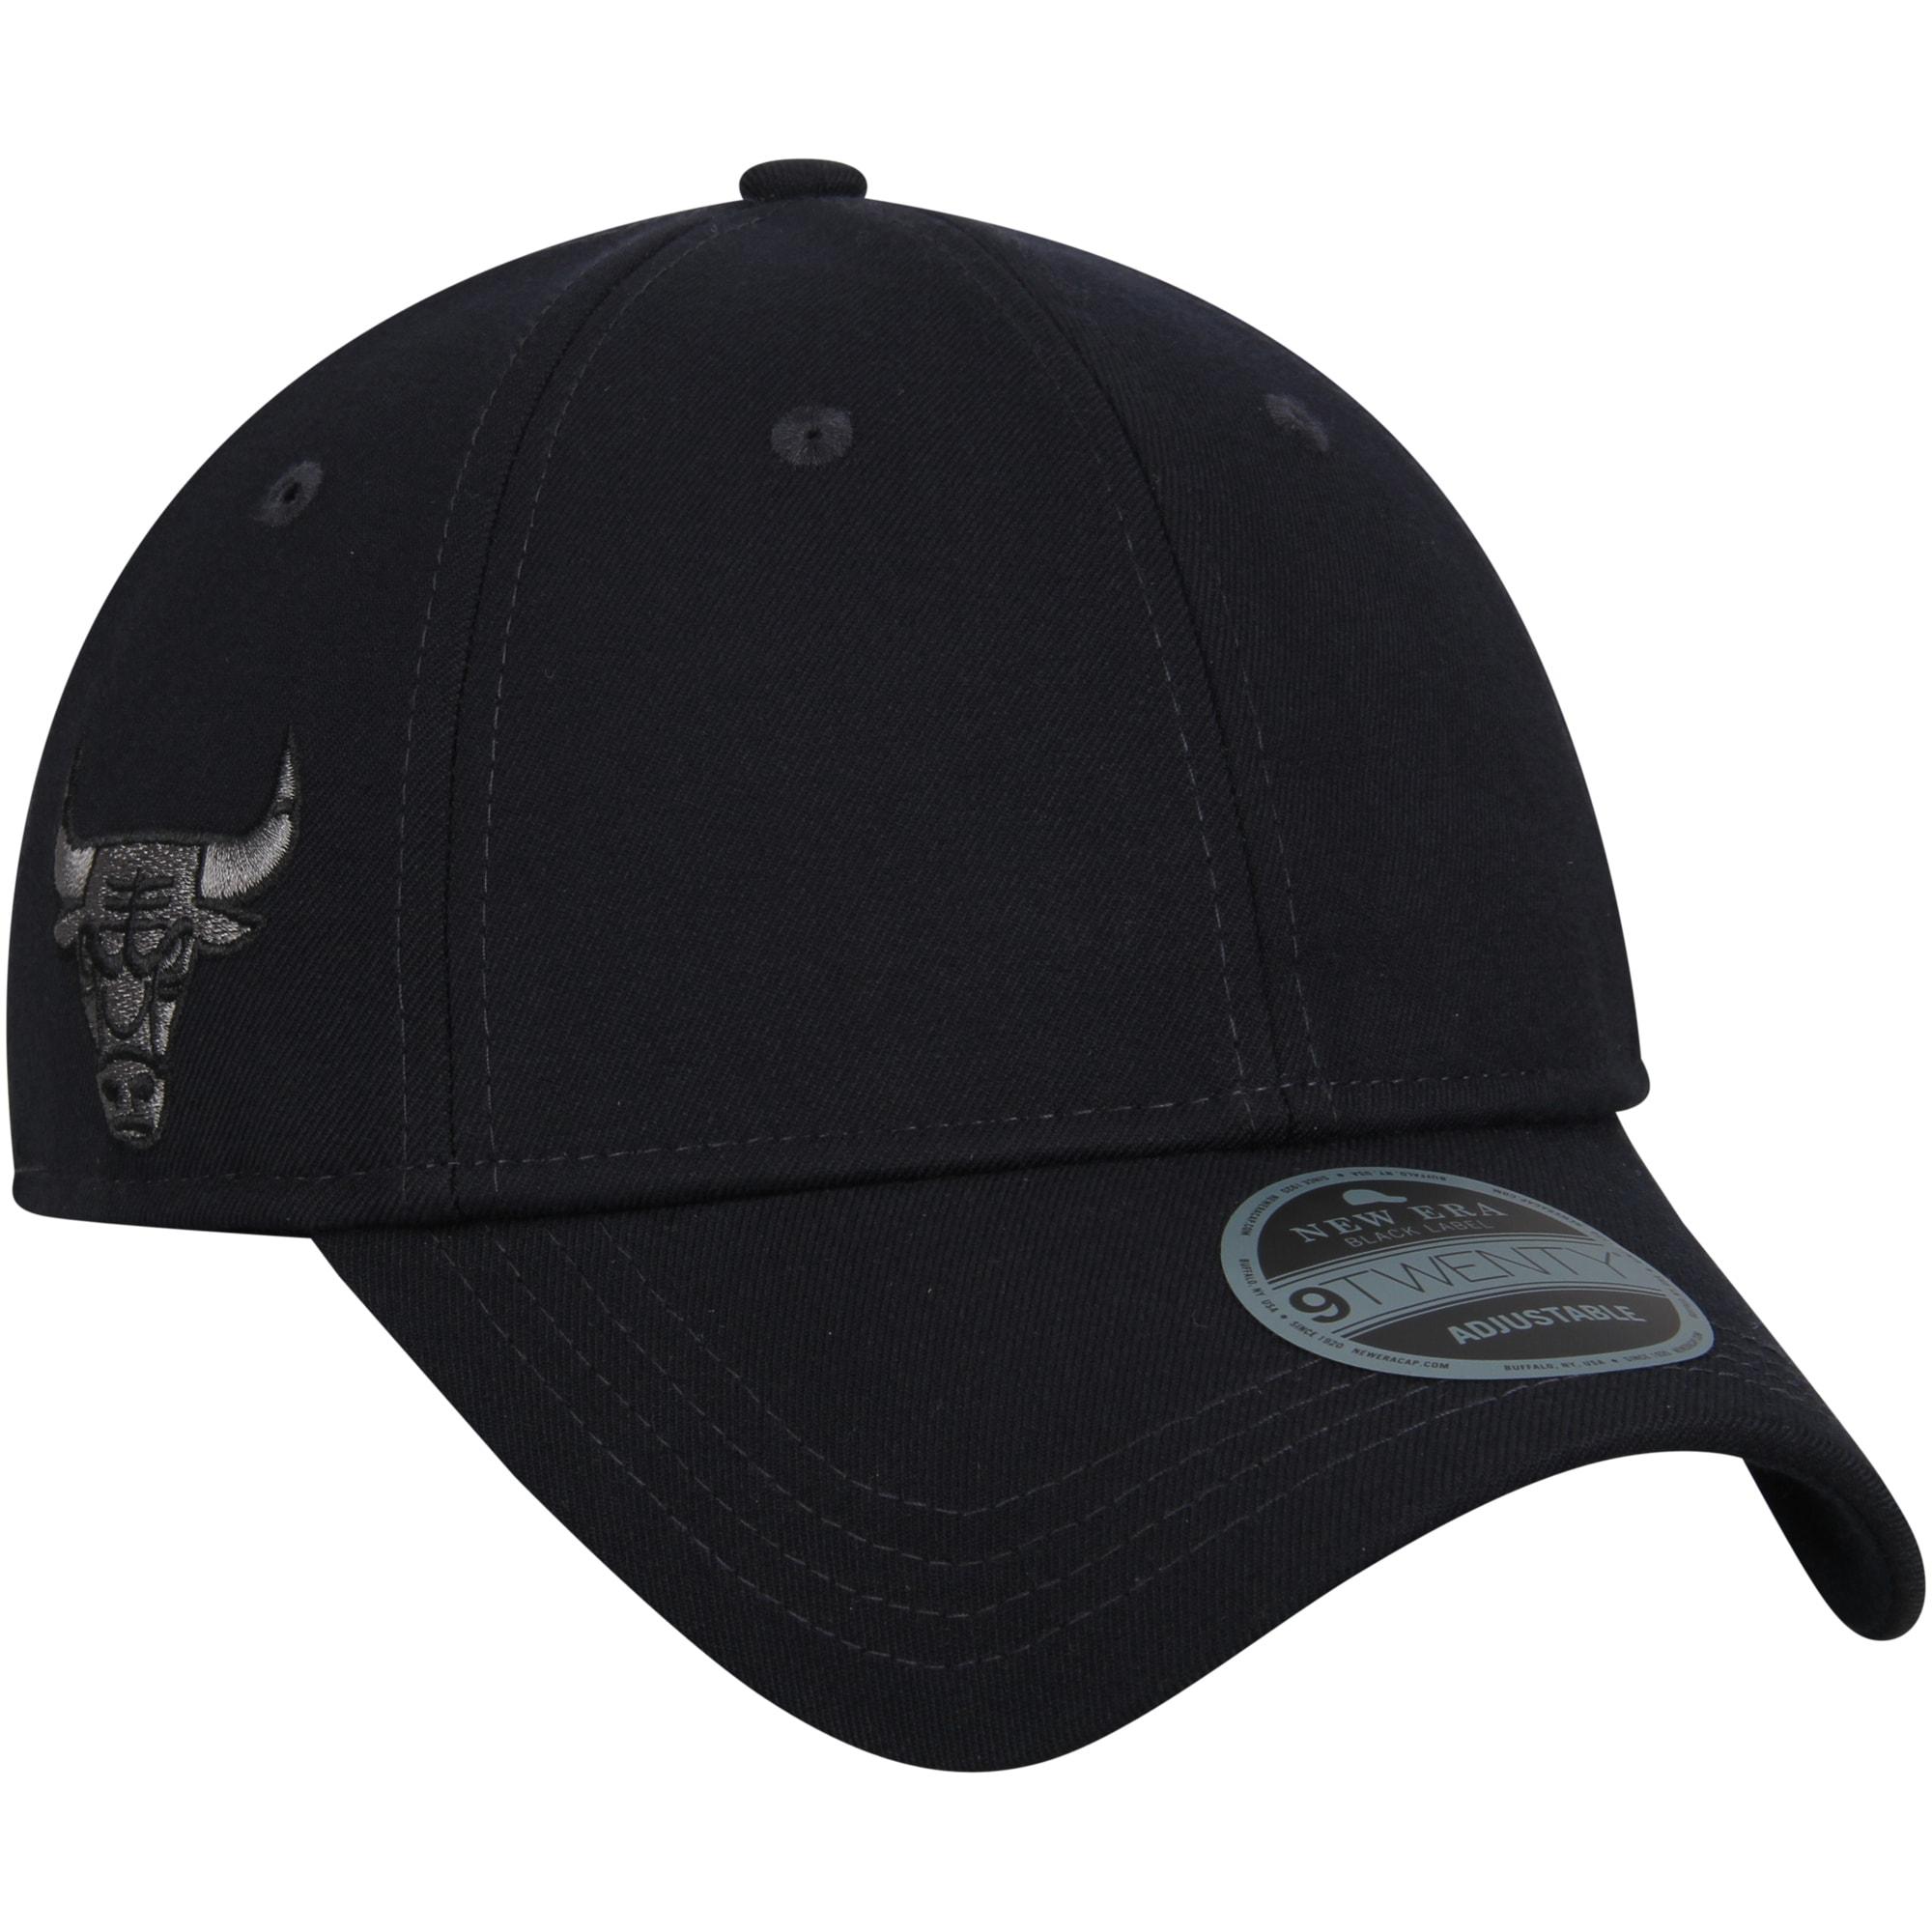 Chicago Bulls New Era Black Label Series Suiting 9TWENTY Adjustable Hat - Black